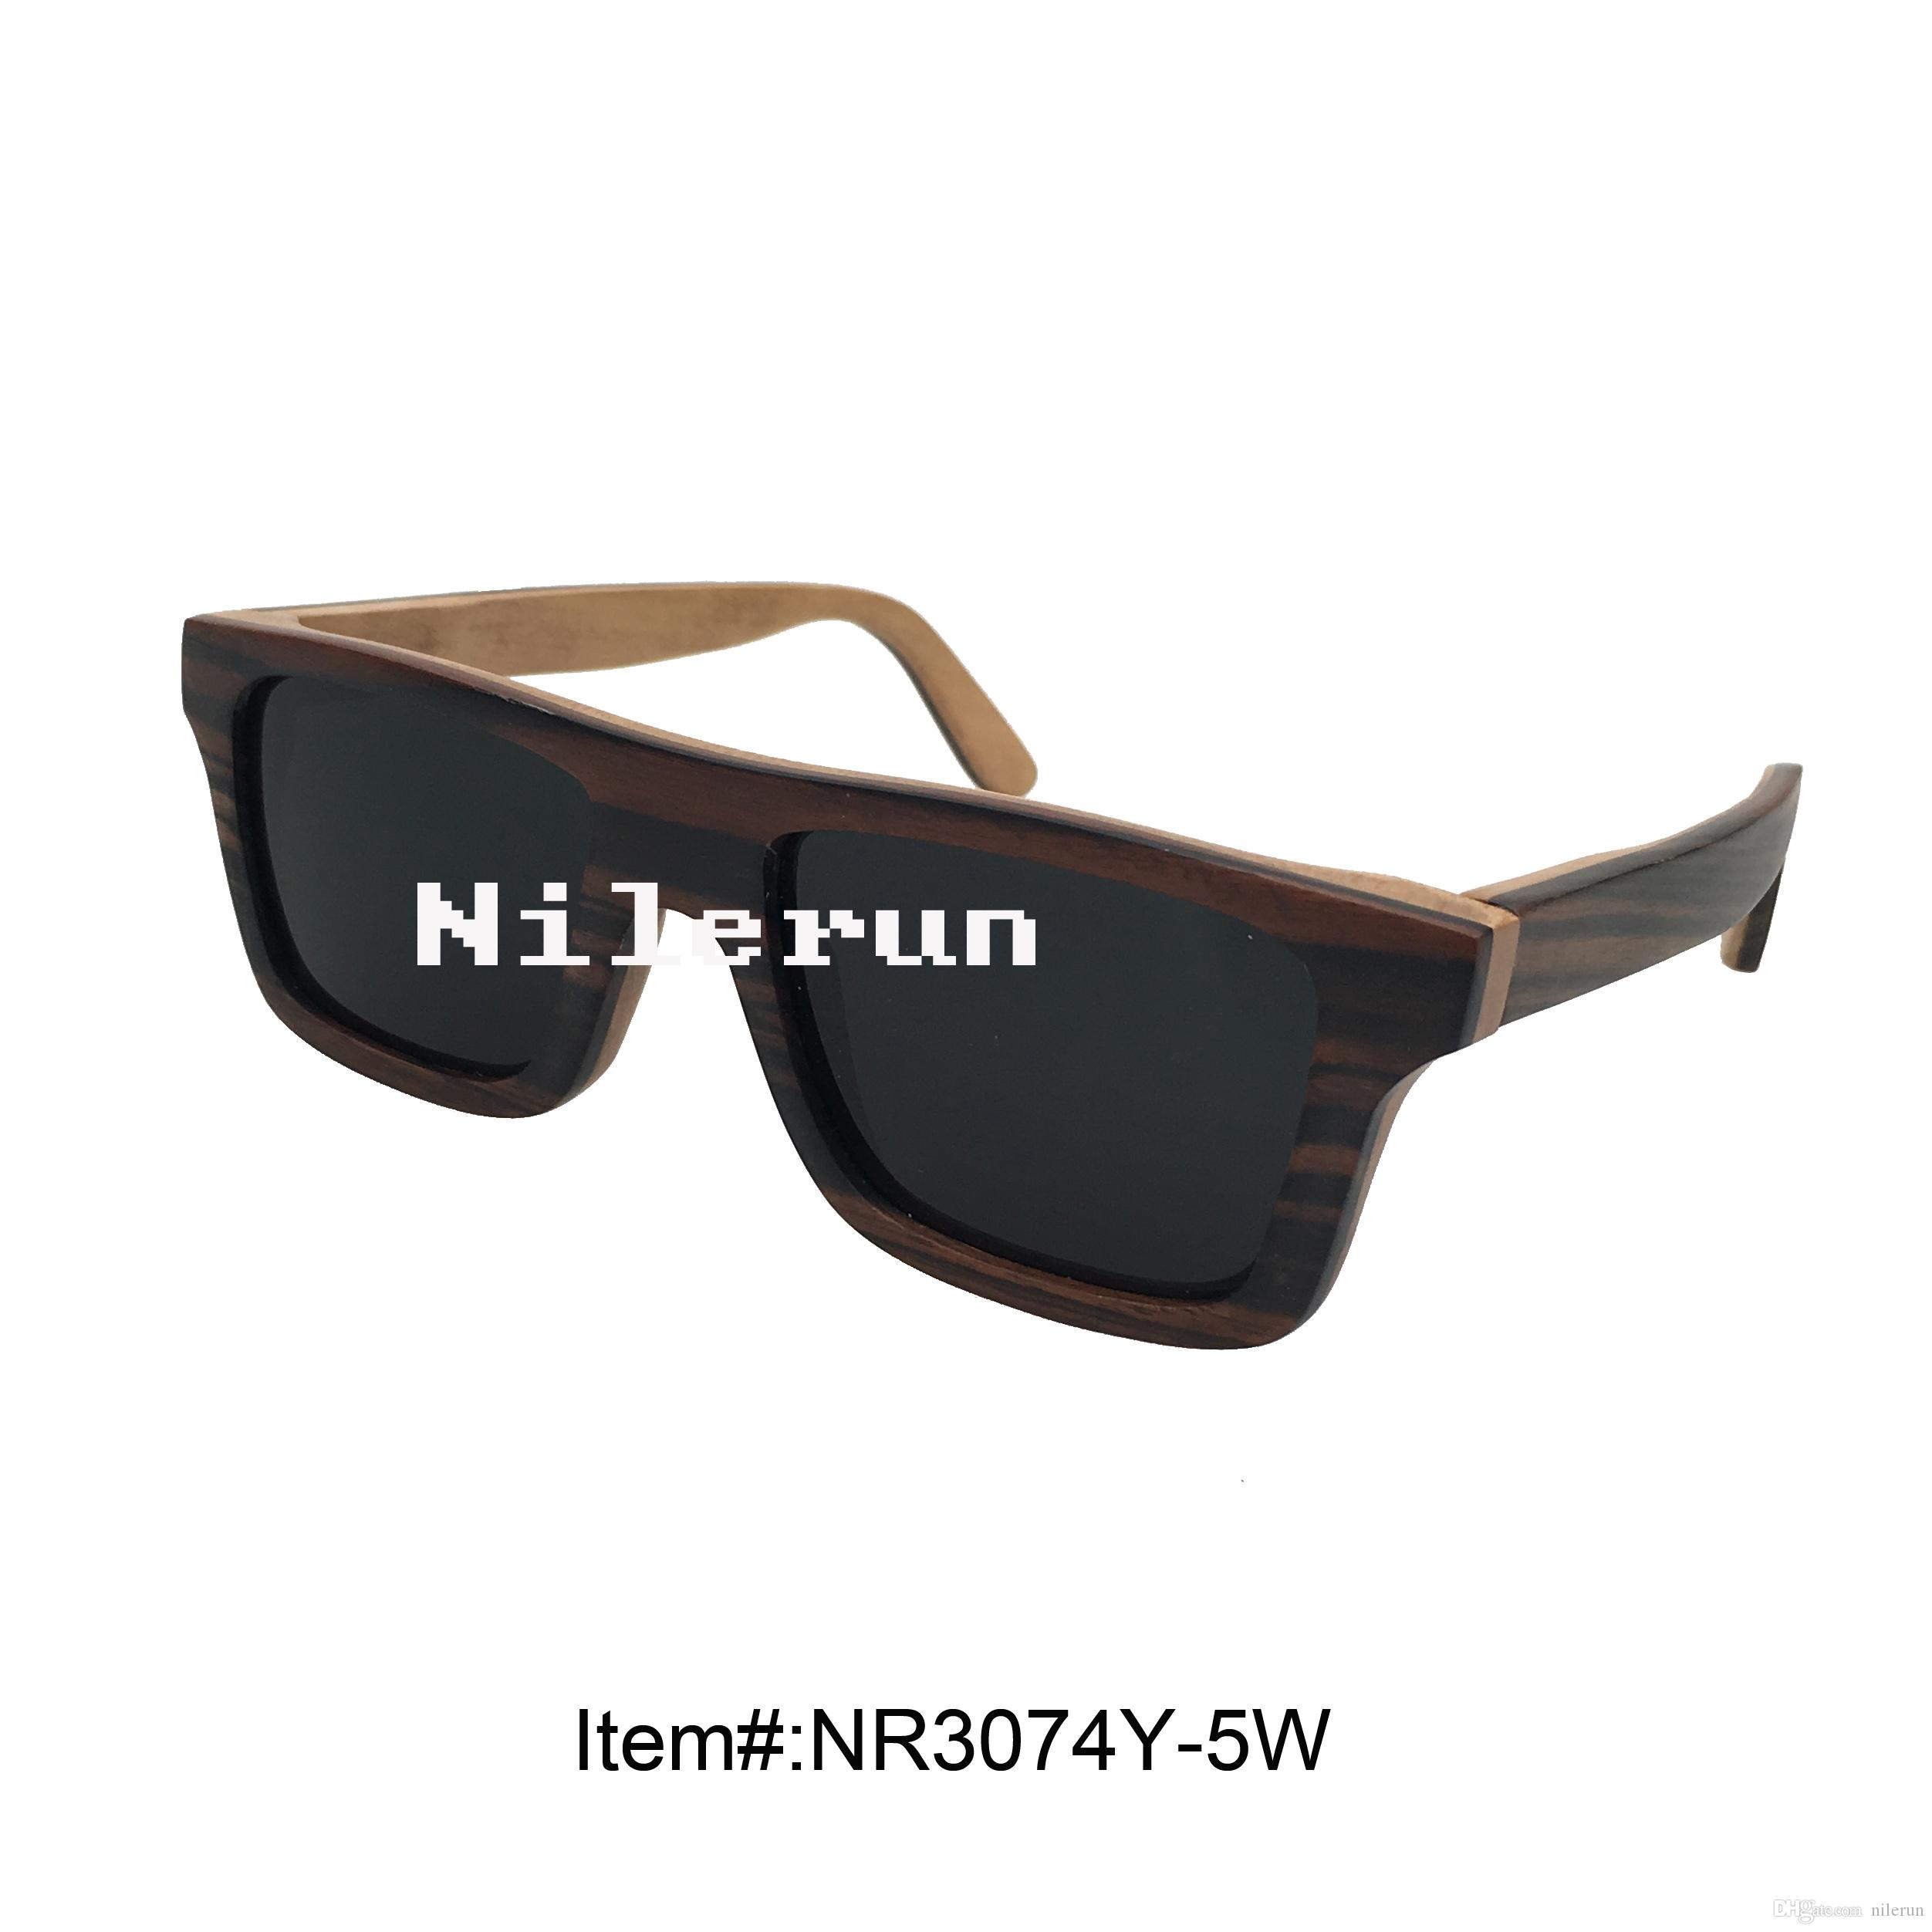 Dekorative Fancy-Sperrholz-Sonnenbrillen